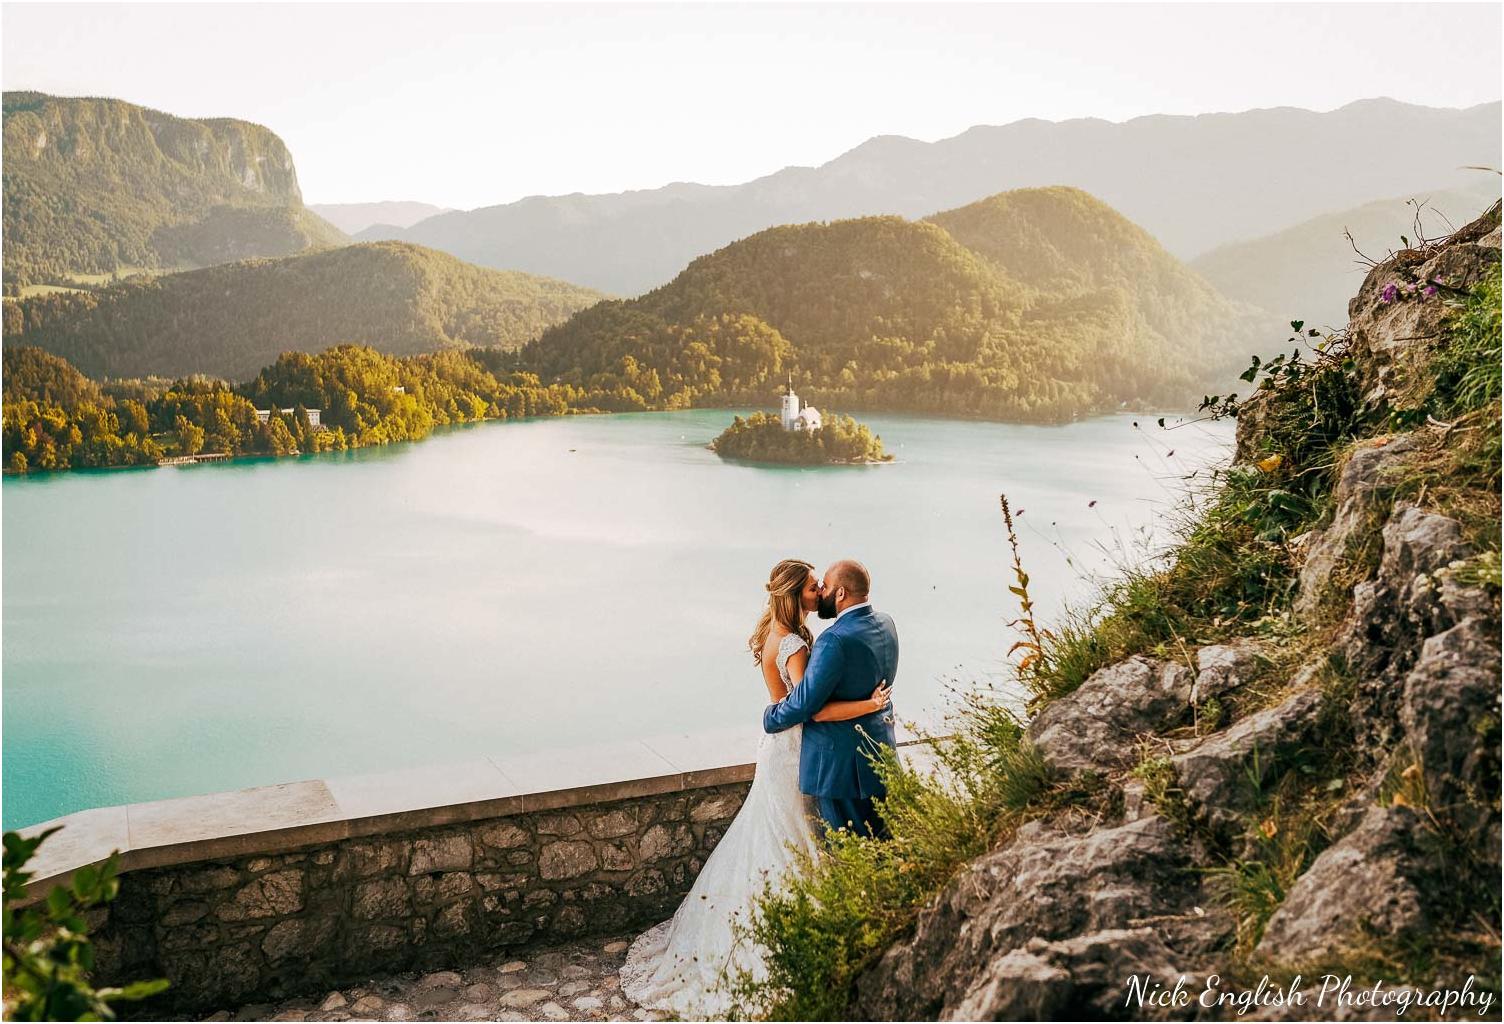 Destination_Wedding_Photographer_Slovenia_Nick_English_Photography-70-29.jpg